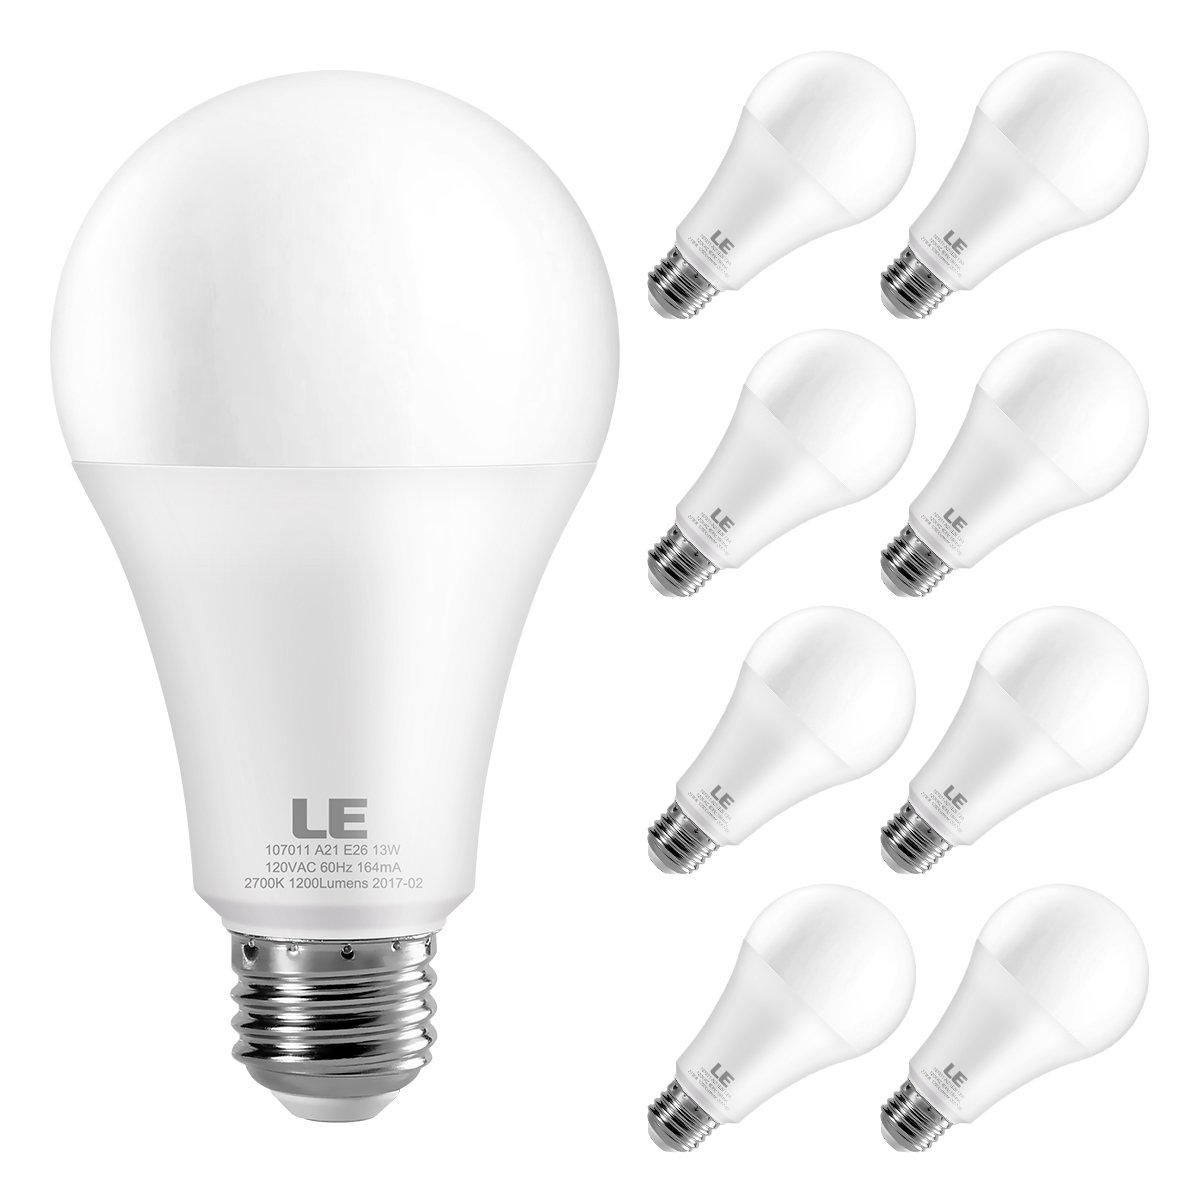 LE 100 Watt Equivalent A21 LED Light Bulbs, 13W LED Bulbs, Super Bright 1200 Lumens 2700K Warm White, 200° Beam Angle, Non- Dimmable E26 Medium Base Bulbs, Pack of 8